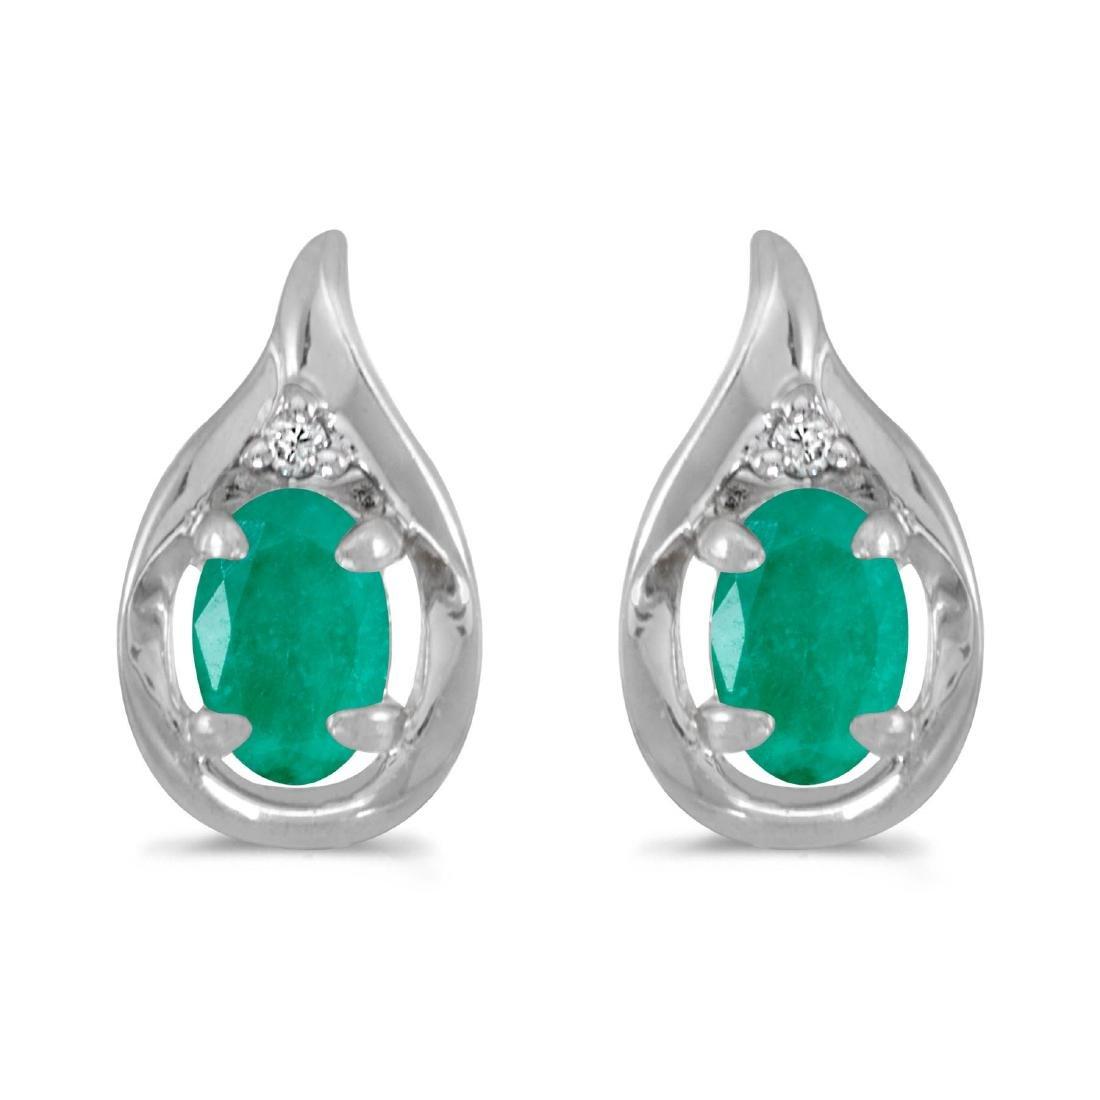 Certified 14k White Gold Oval Emerald And Diamond Earri